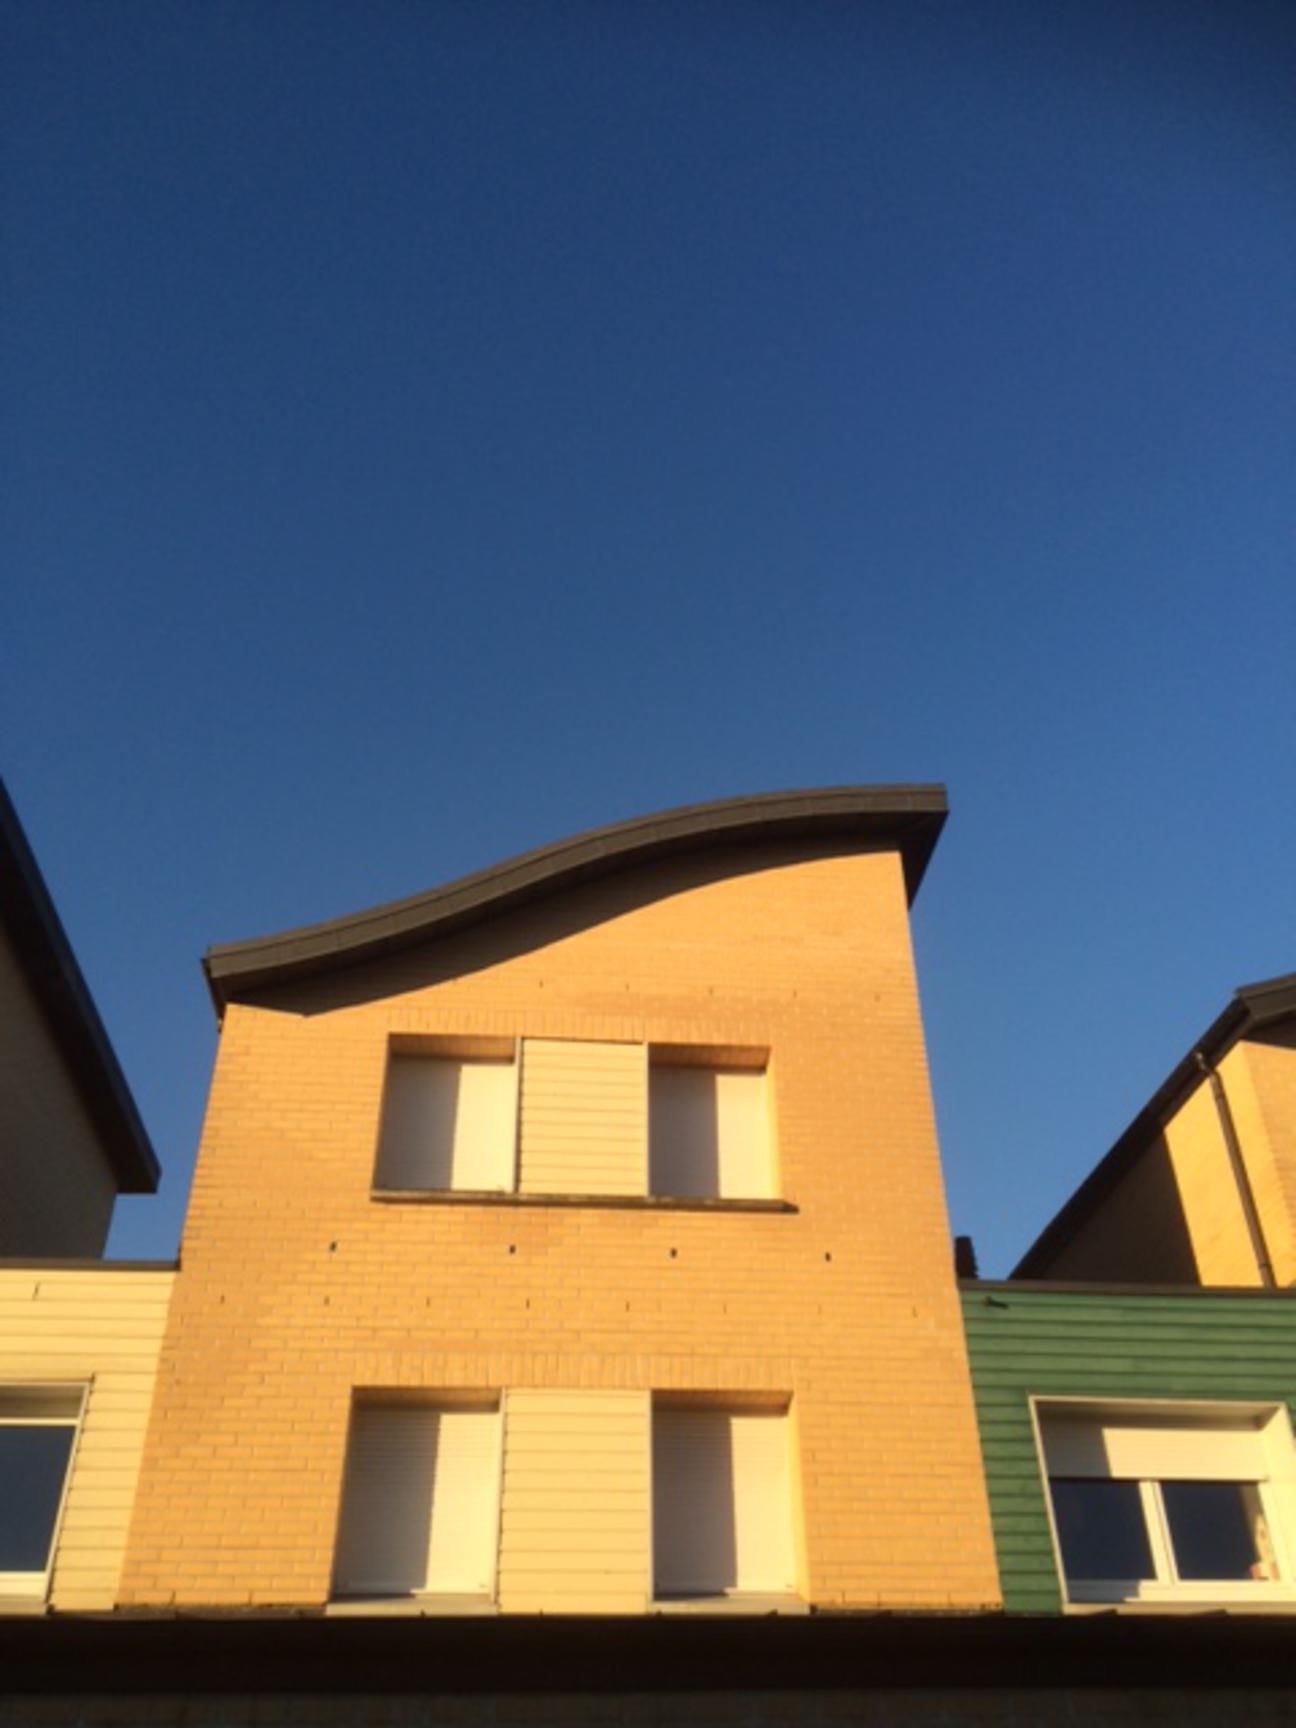 Ventes - Agence Immobilière BECI - Vente et location de biens ...